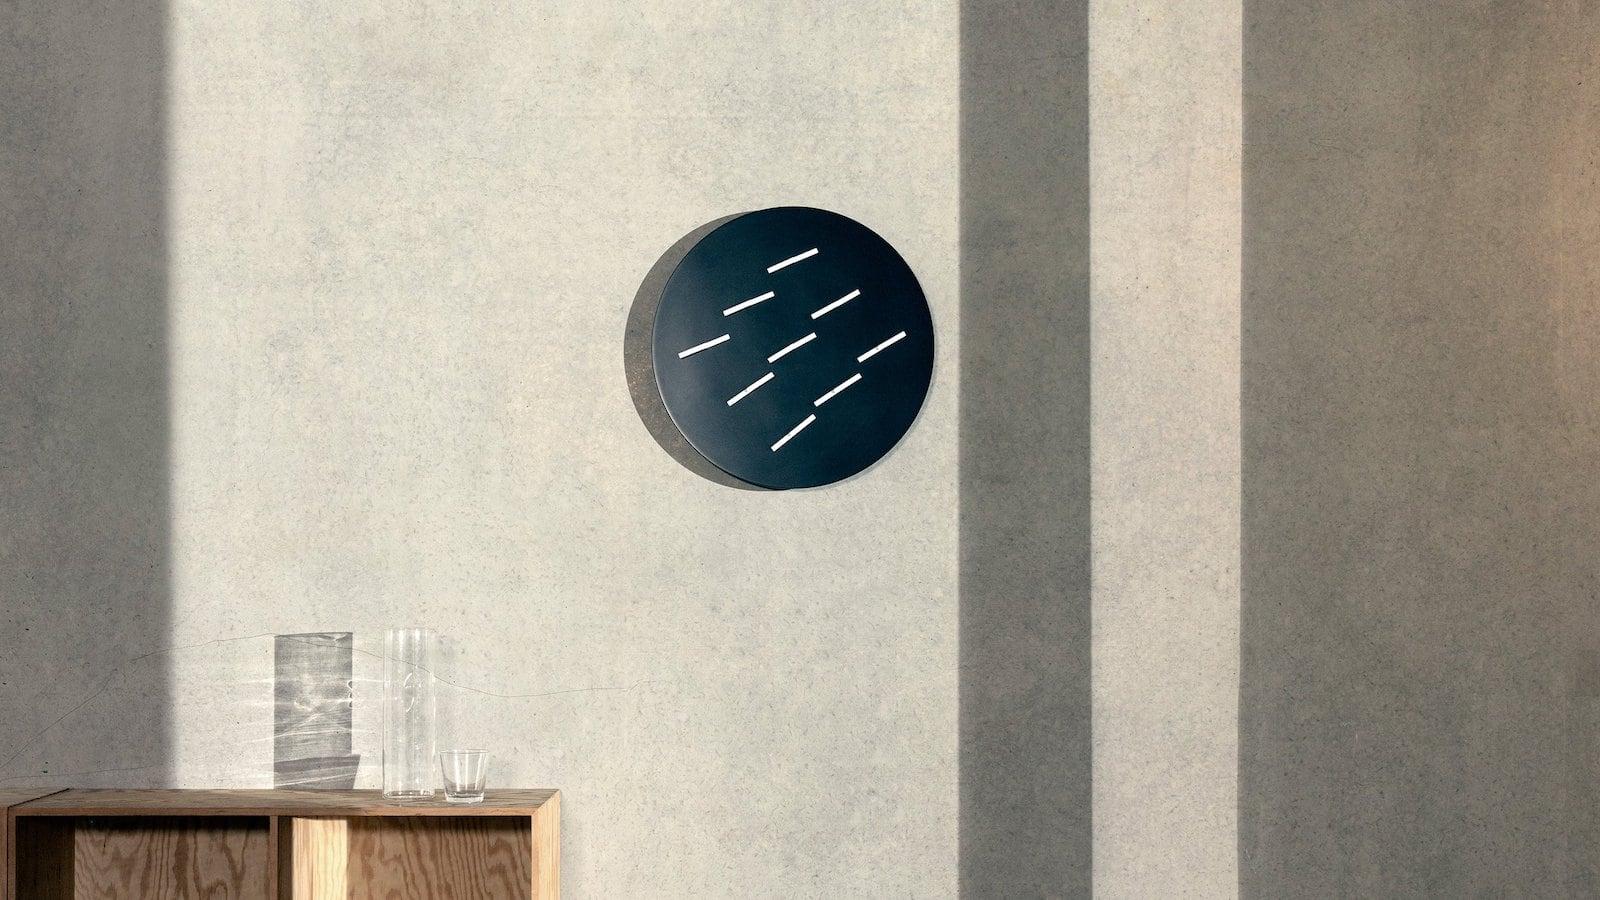 Humans since 1982 ClockClock 9 choreographed clock interprets time in a unique way